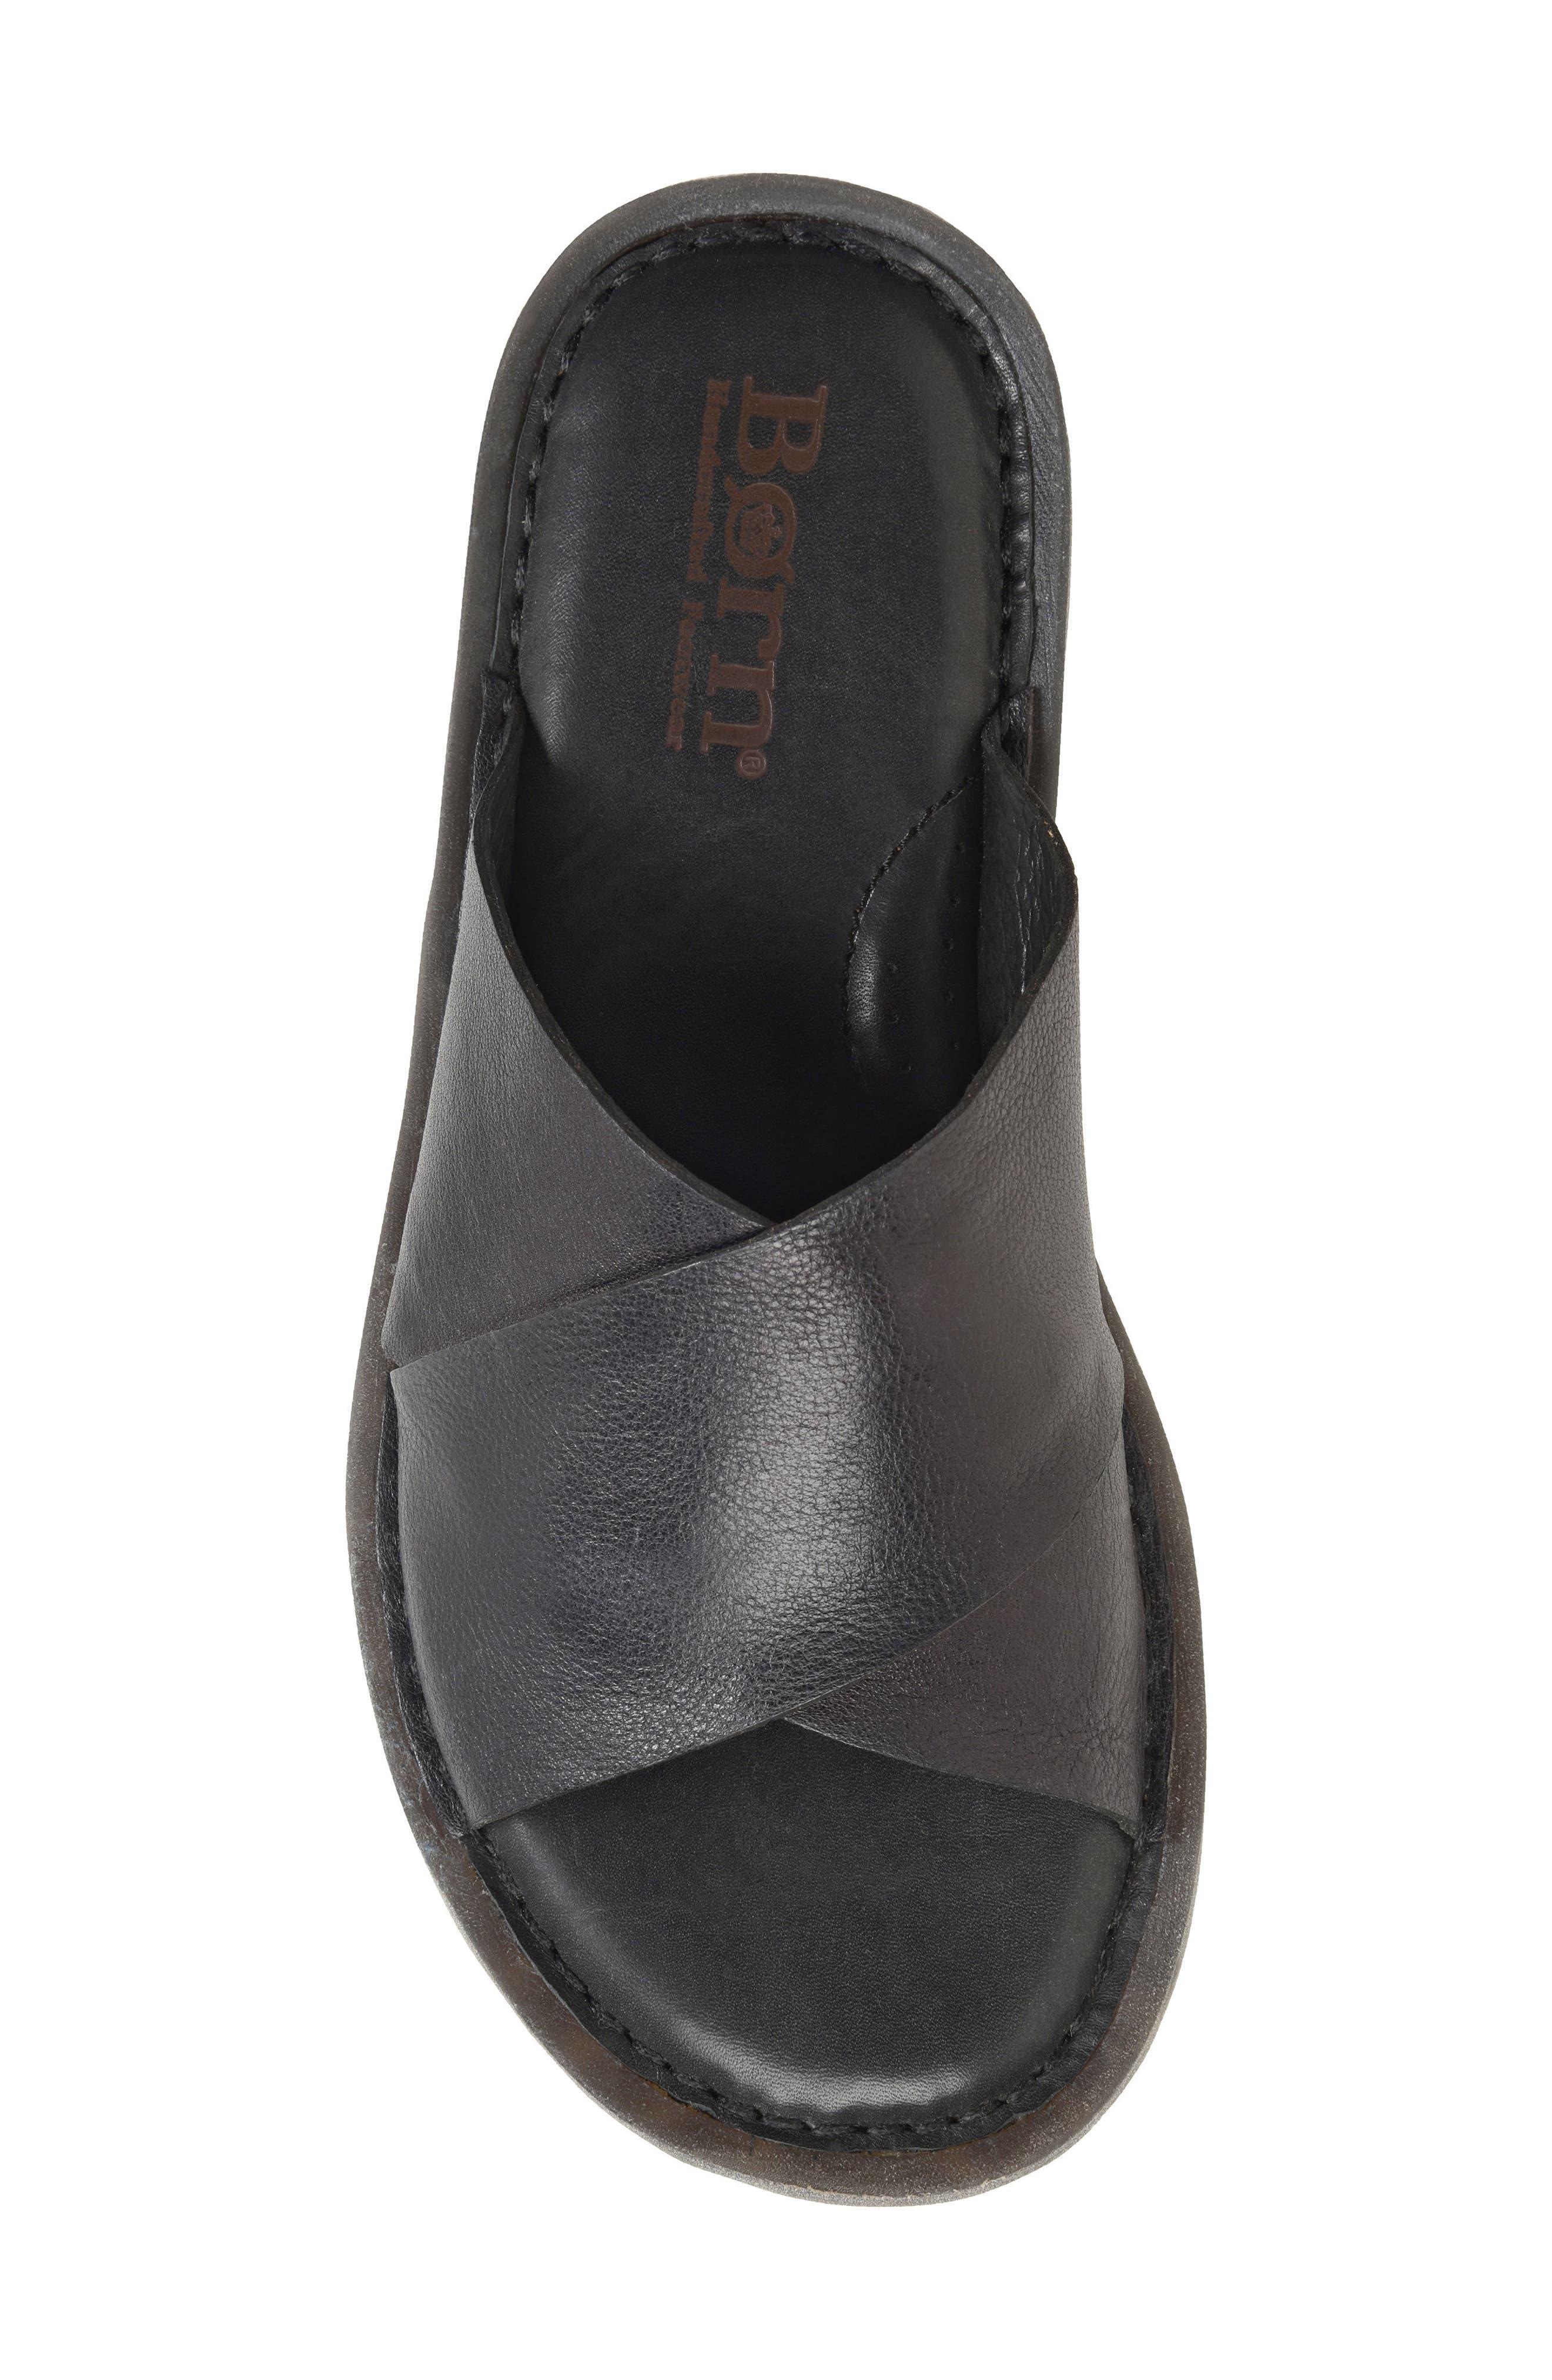 Getaway Slide Sandal,                             Alternate thumbnail 5, color,                             BLACK LEATHER